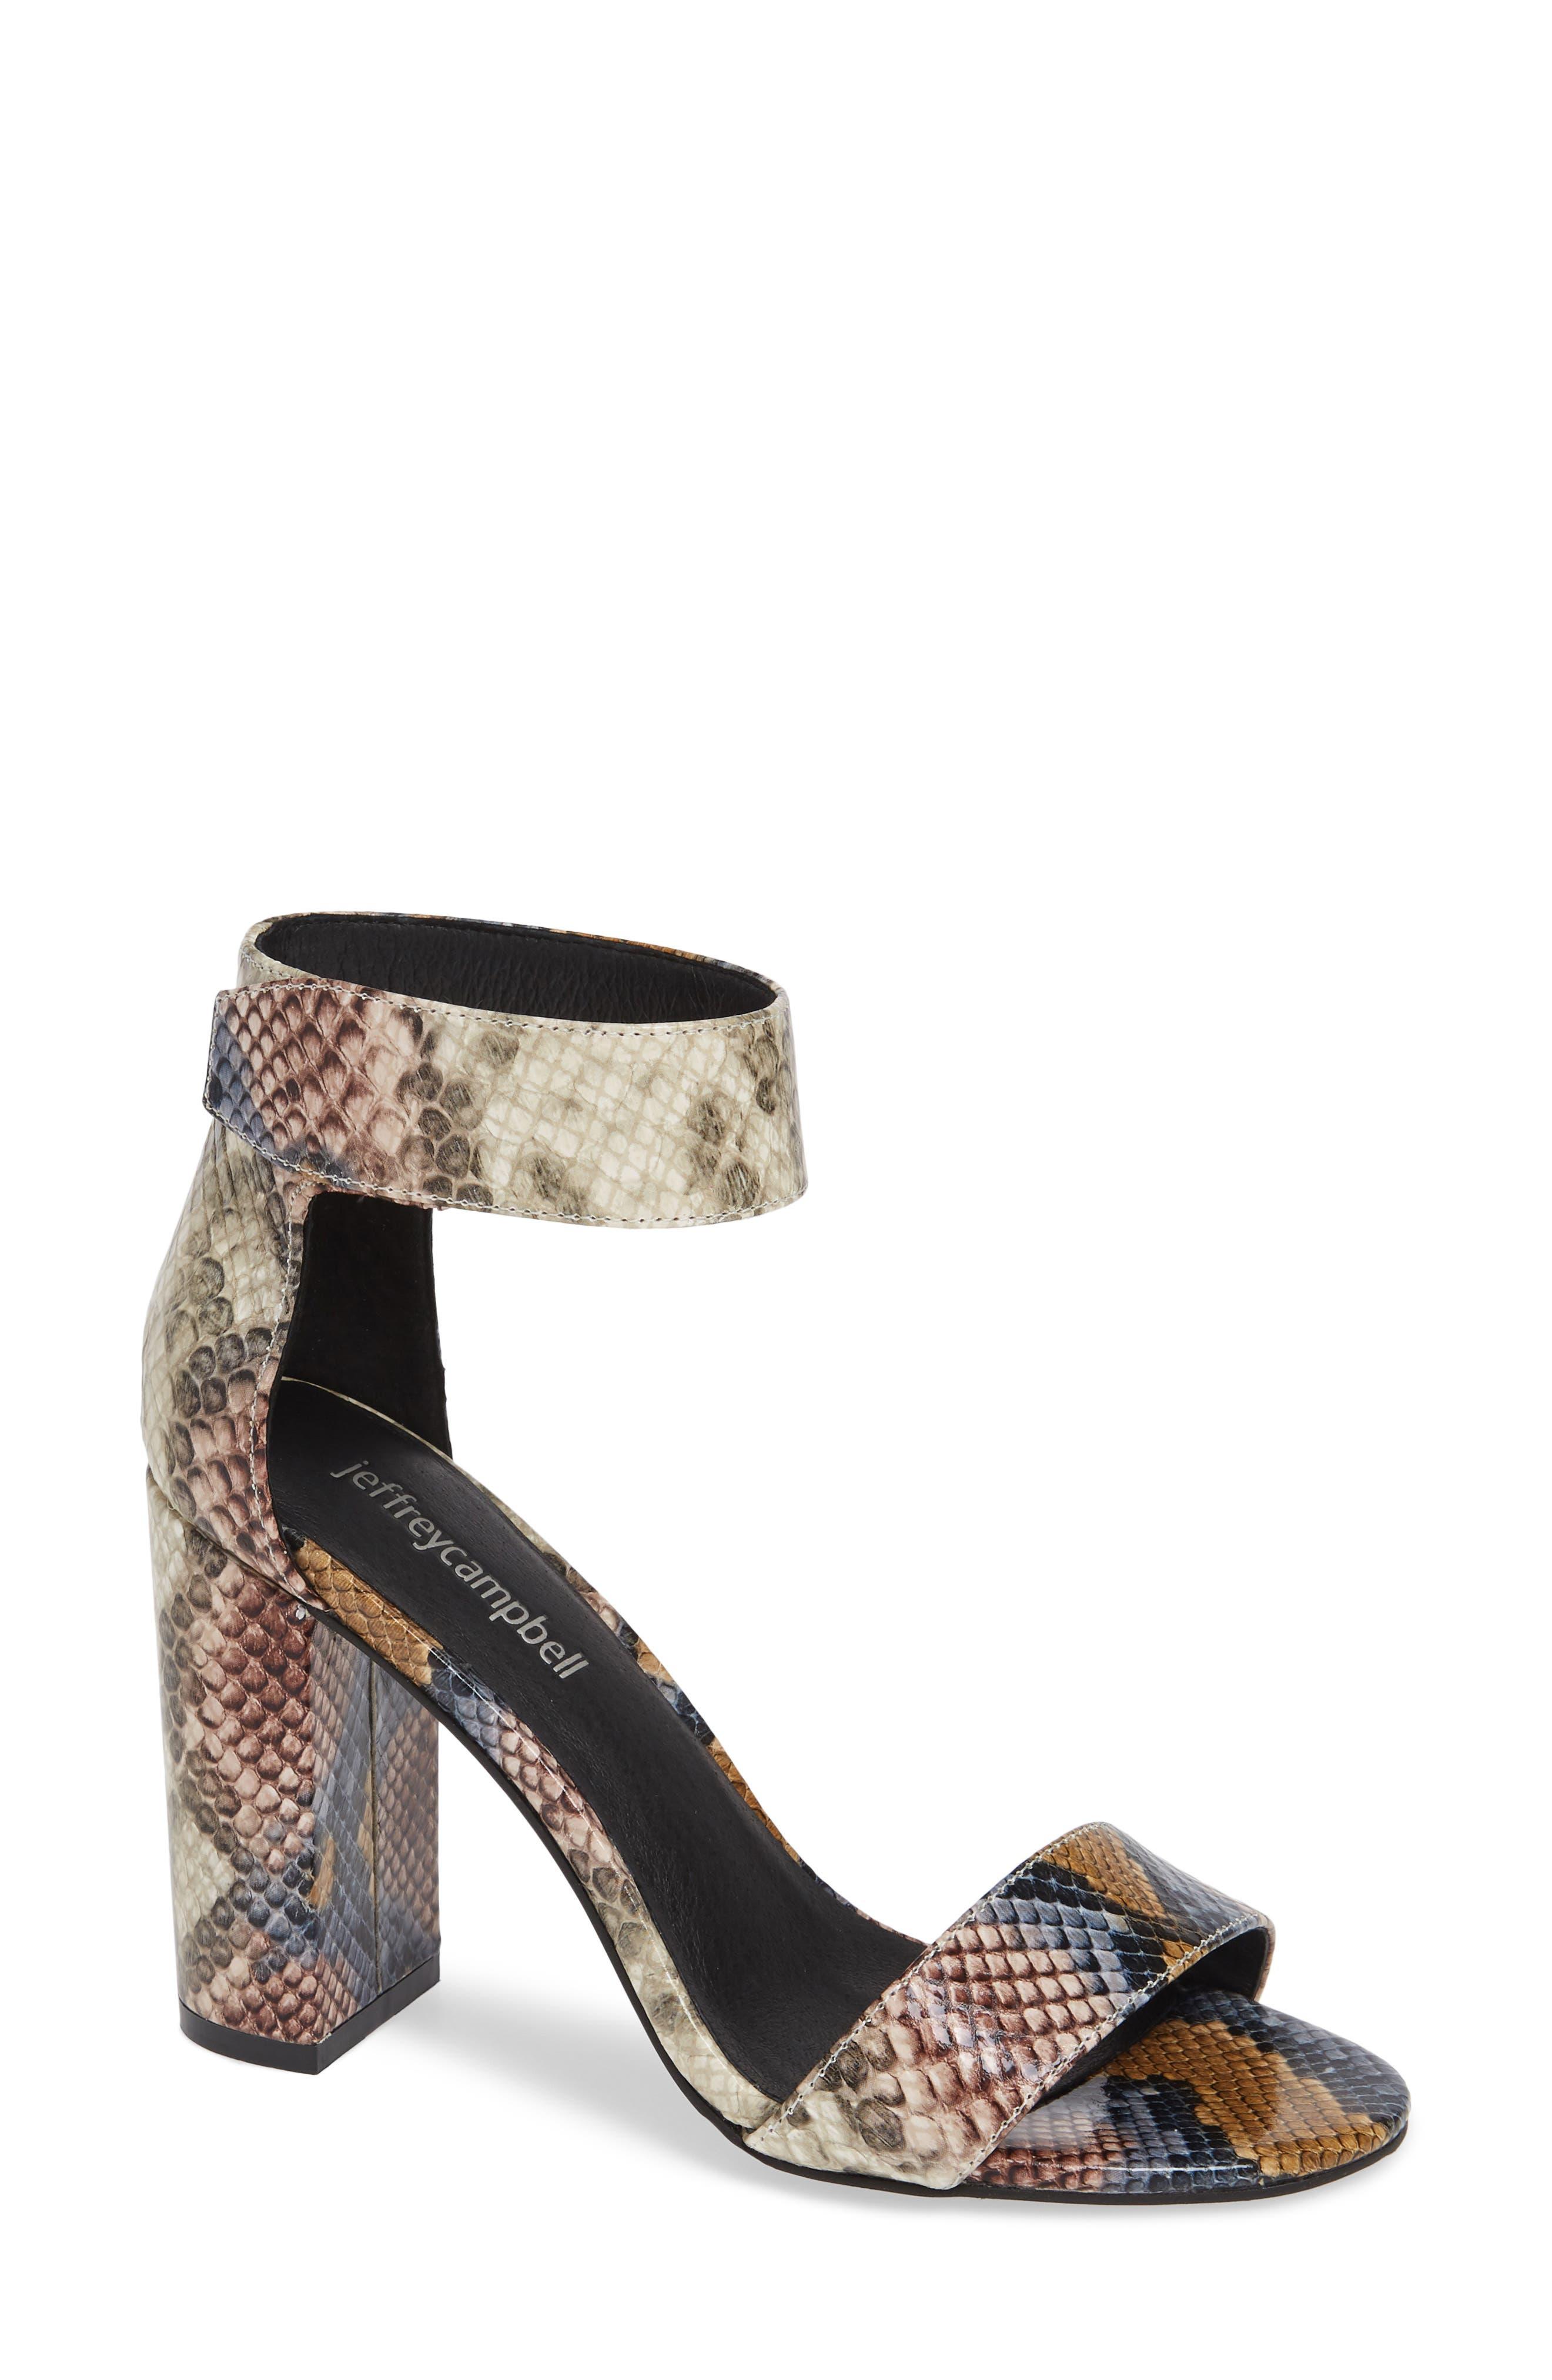 944cc986fa78 Women s Jeffrey Campbell Wedding Shoes